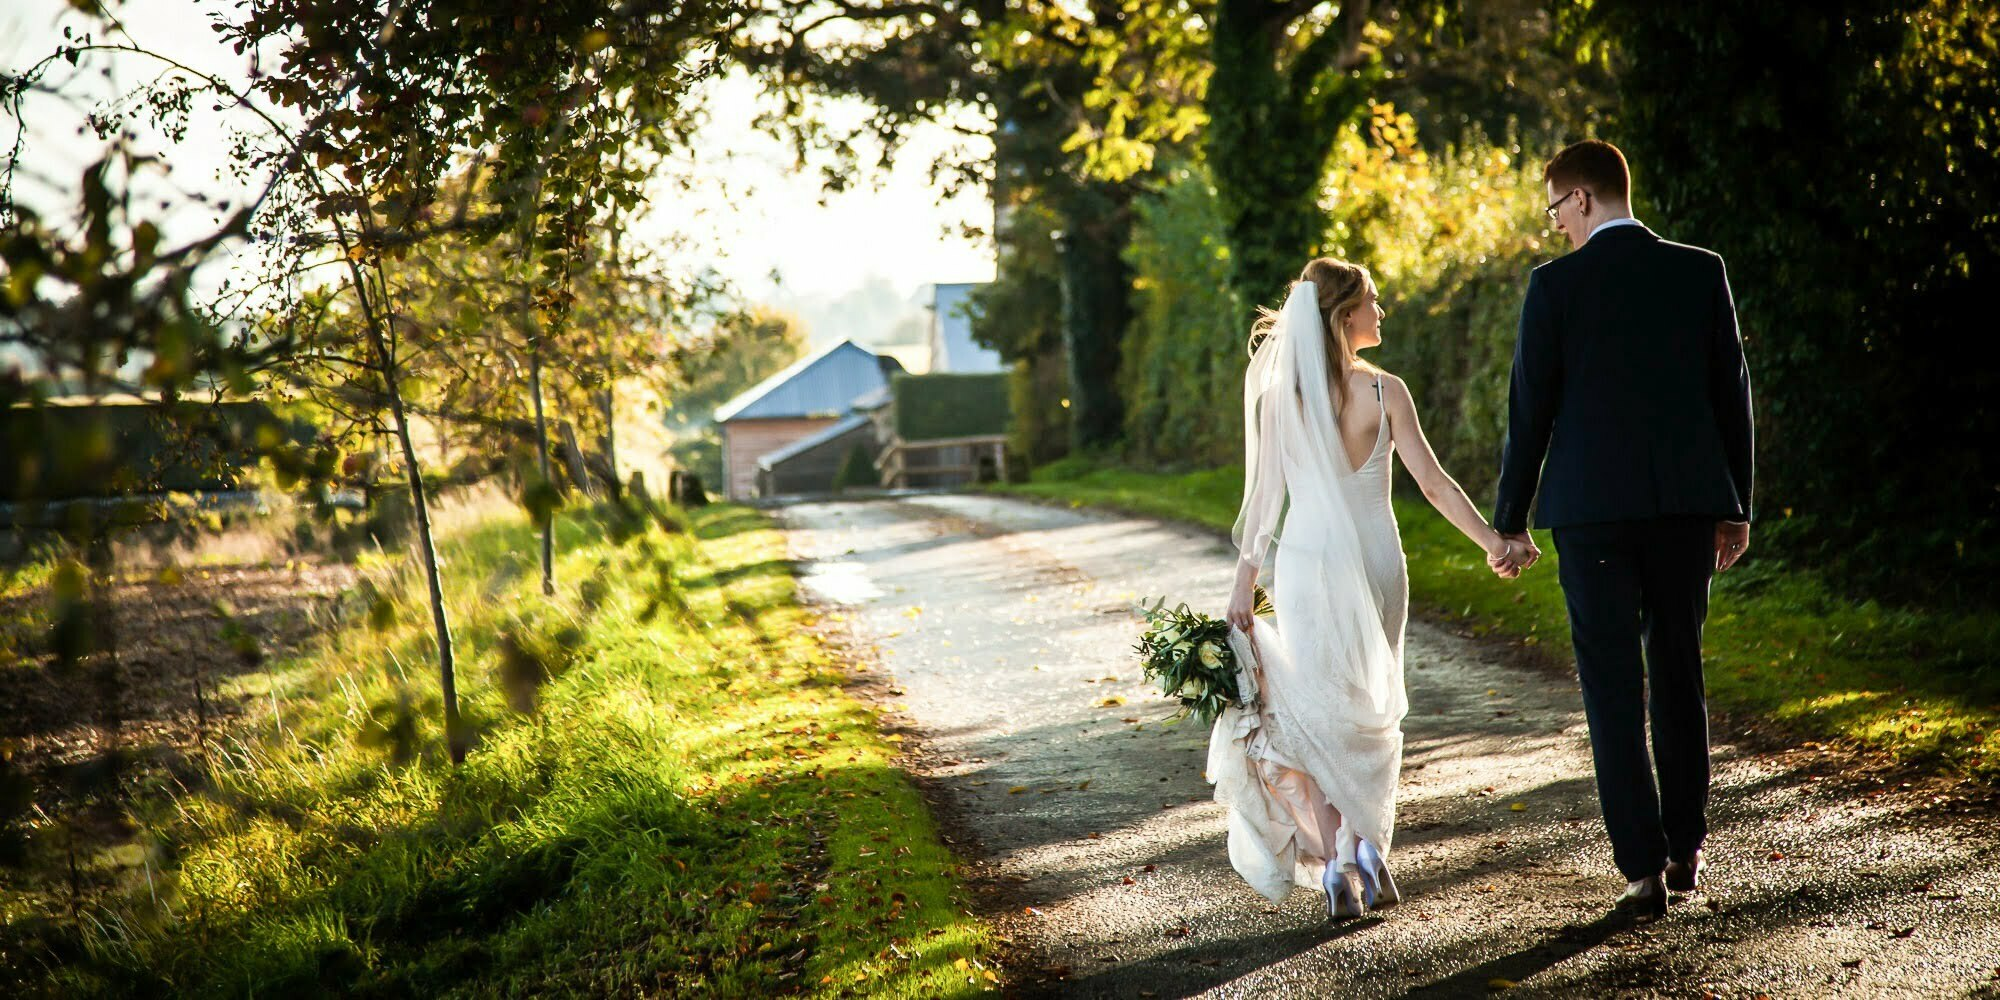 Autumn Weddings at Cripps Barn 16